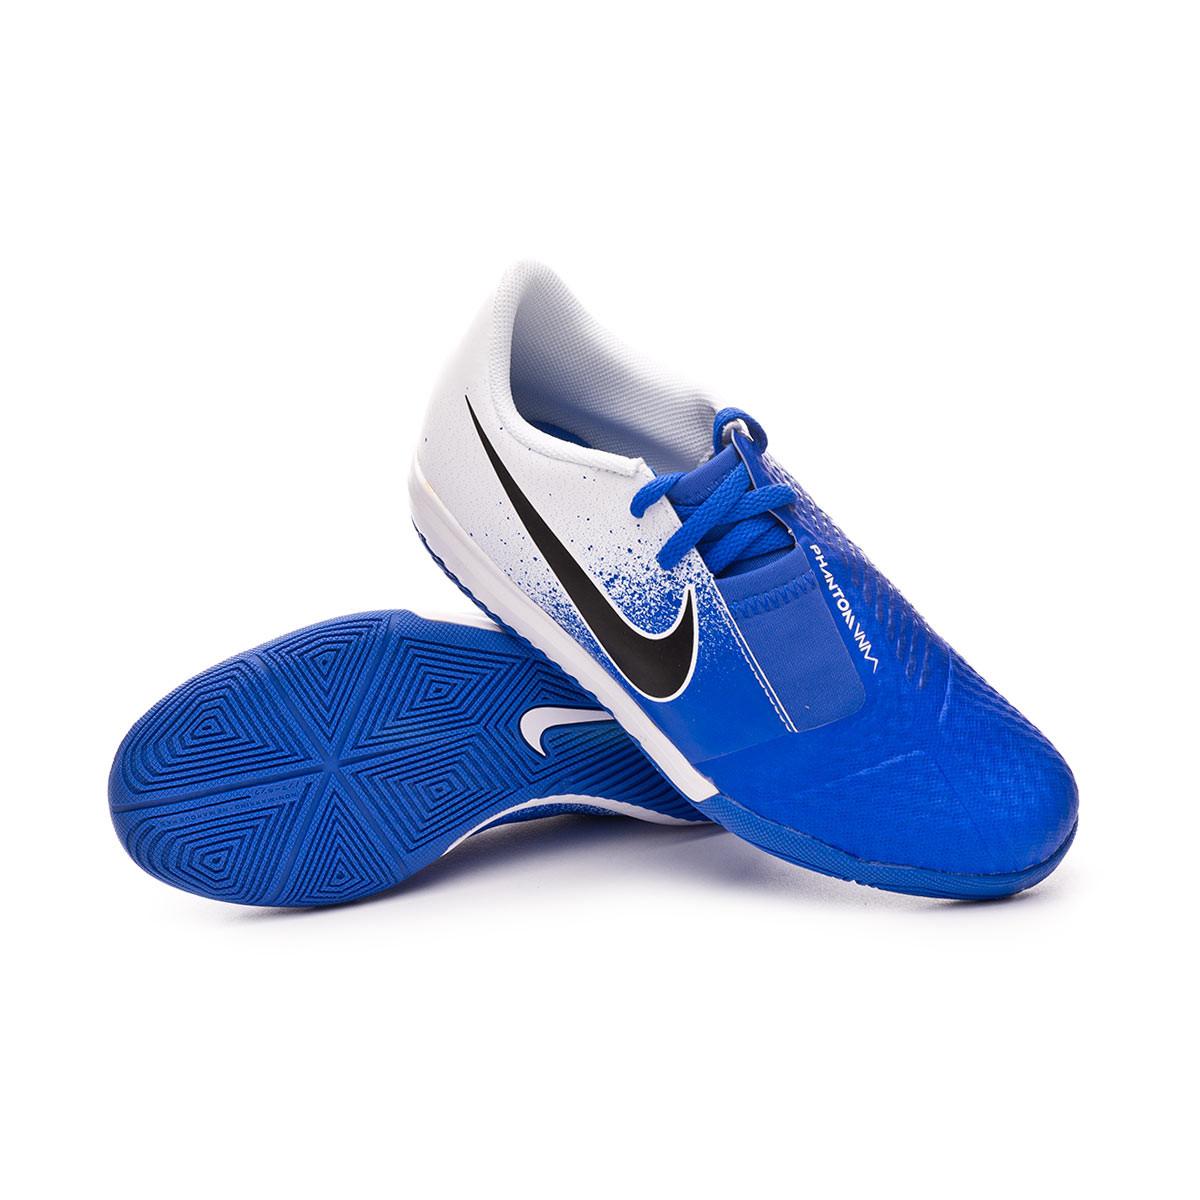 0882b9513 Futsal Boot Nike Phantom VenomX Academy IC Niño White-Black-Racer blue -  Tienda de fútbol Fútbol Emotion